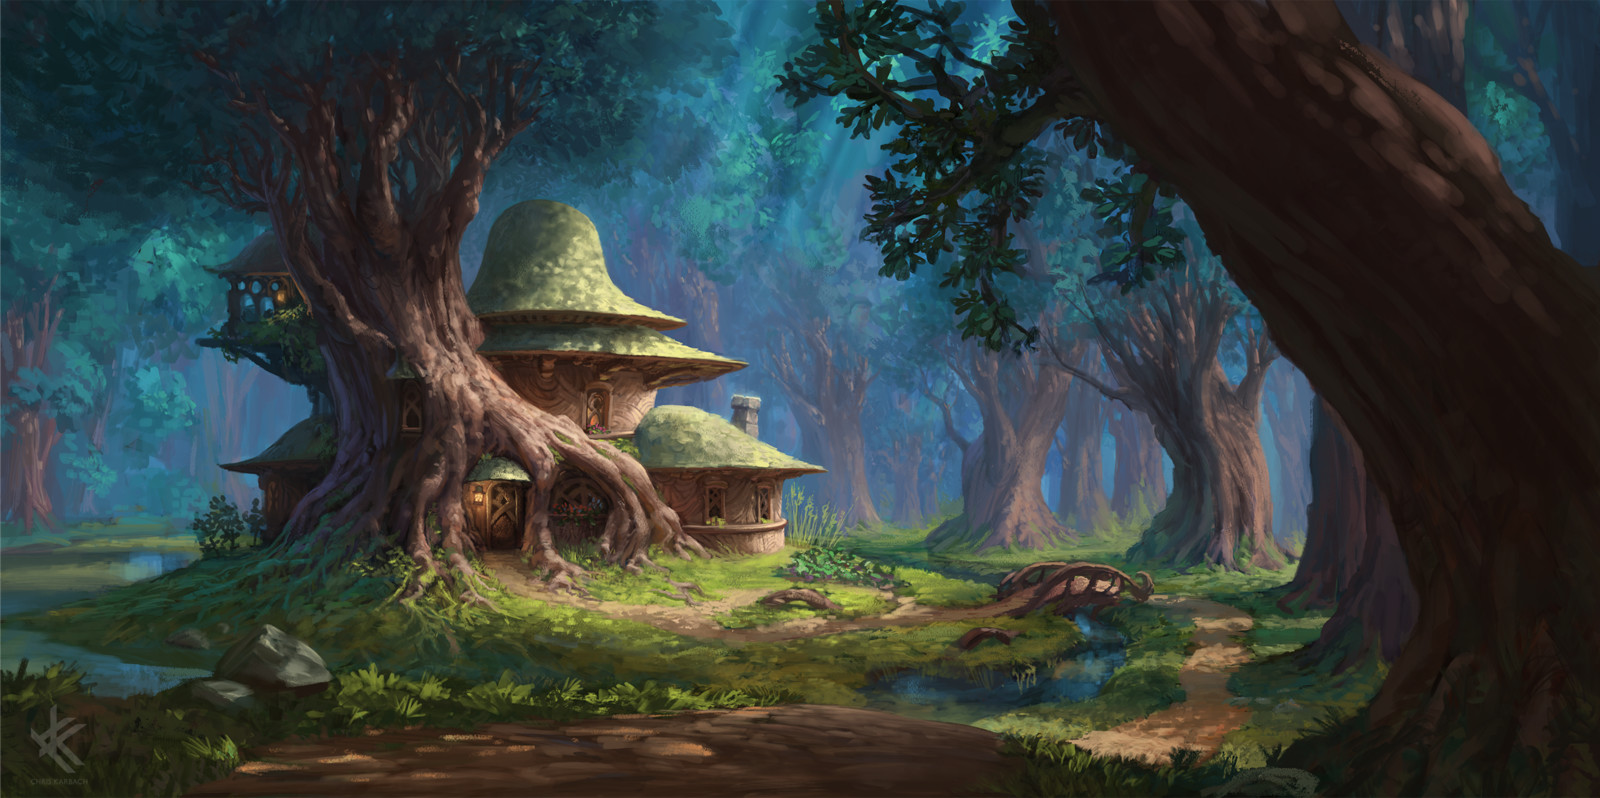 Rootbeard's House